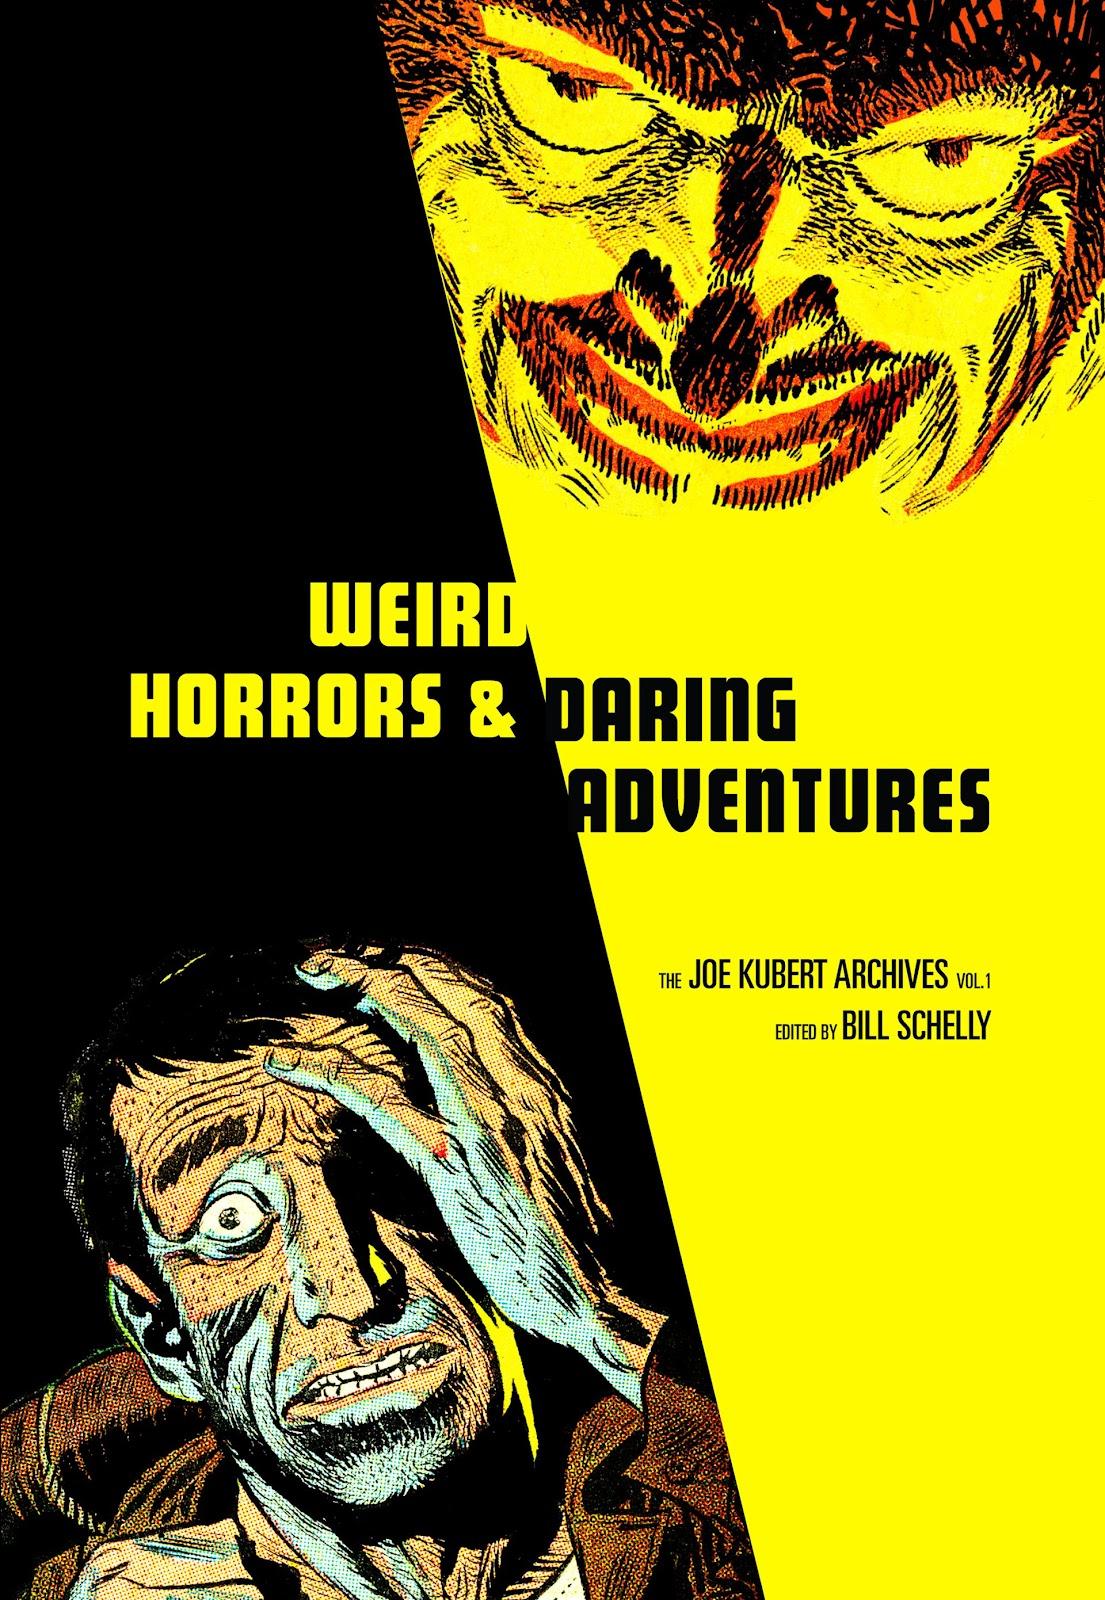 Read online The Joe Kubert Archives comic -  Issue # TPB (Part 1) - 4